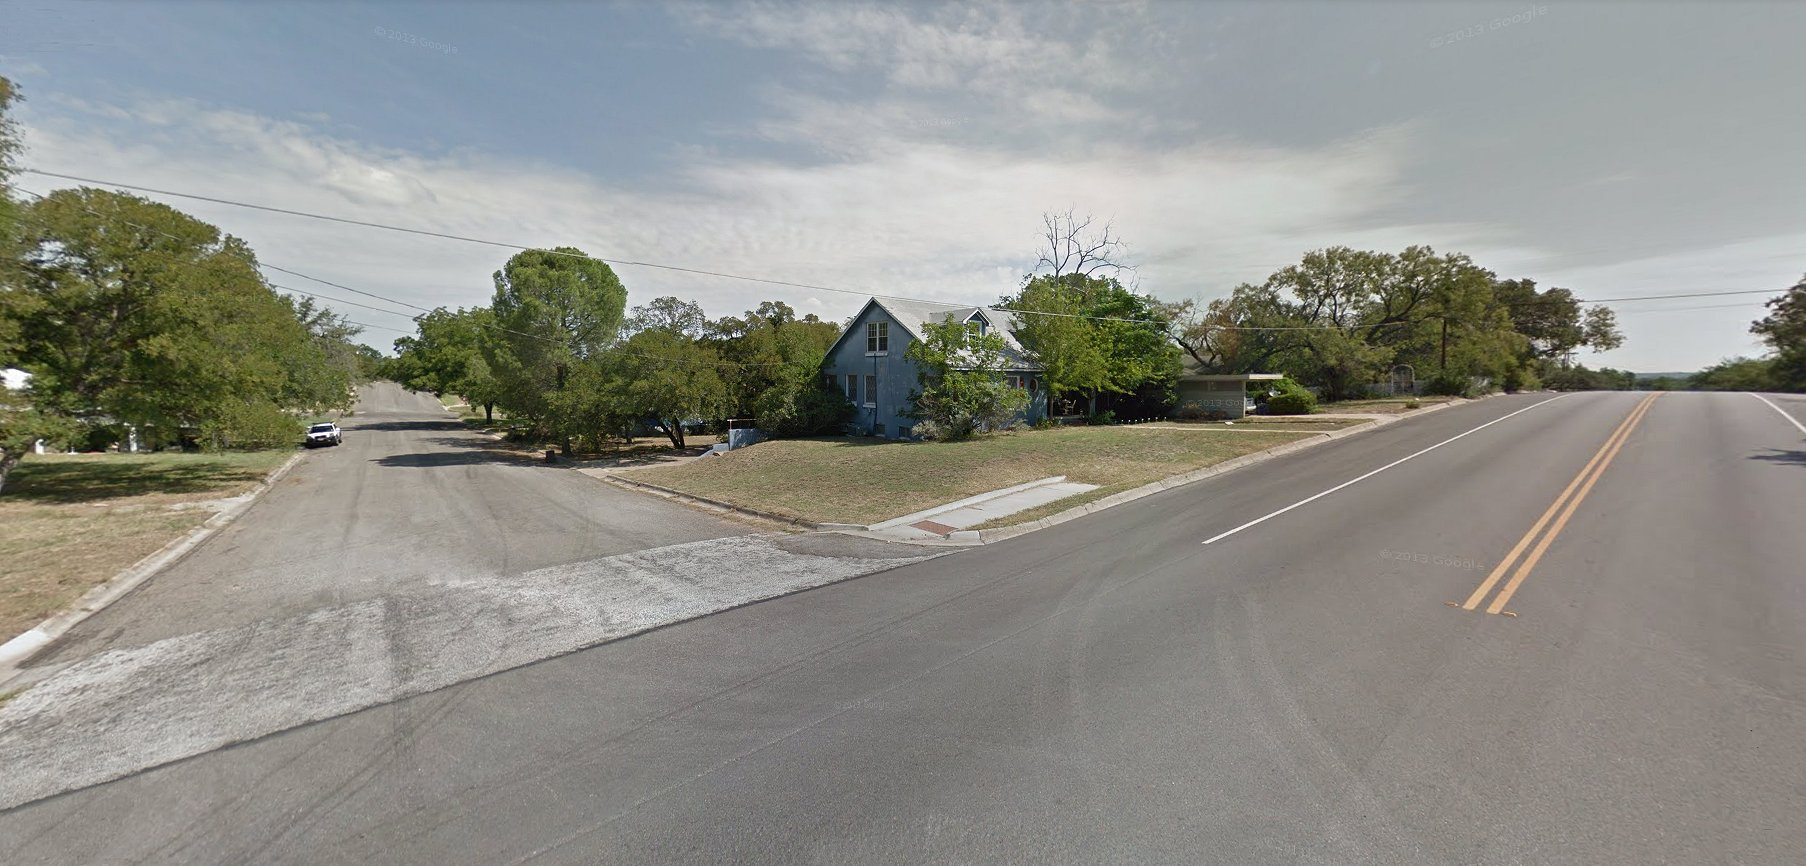 Home For Sale | Lampasas, Texas